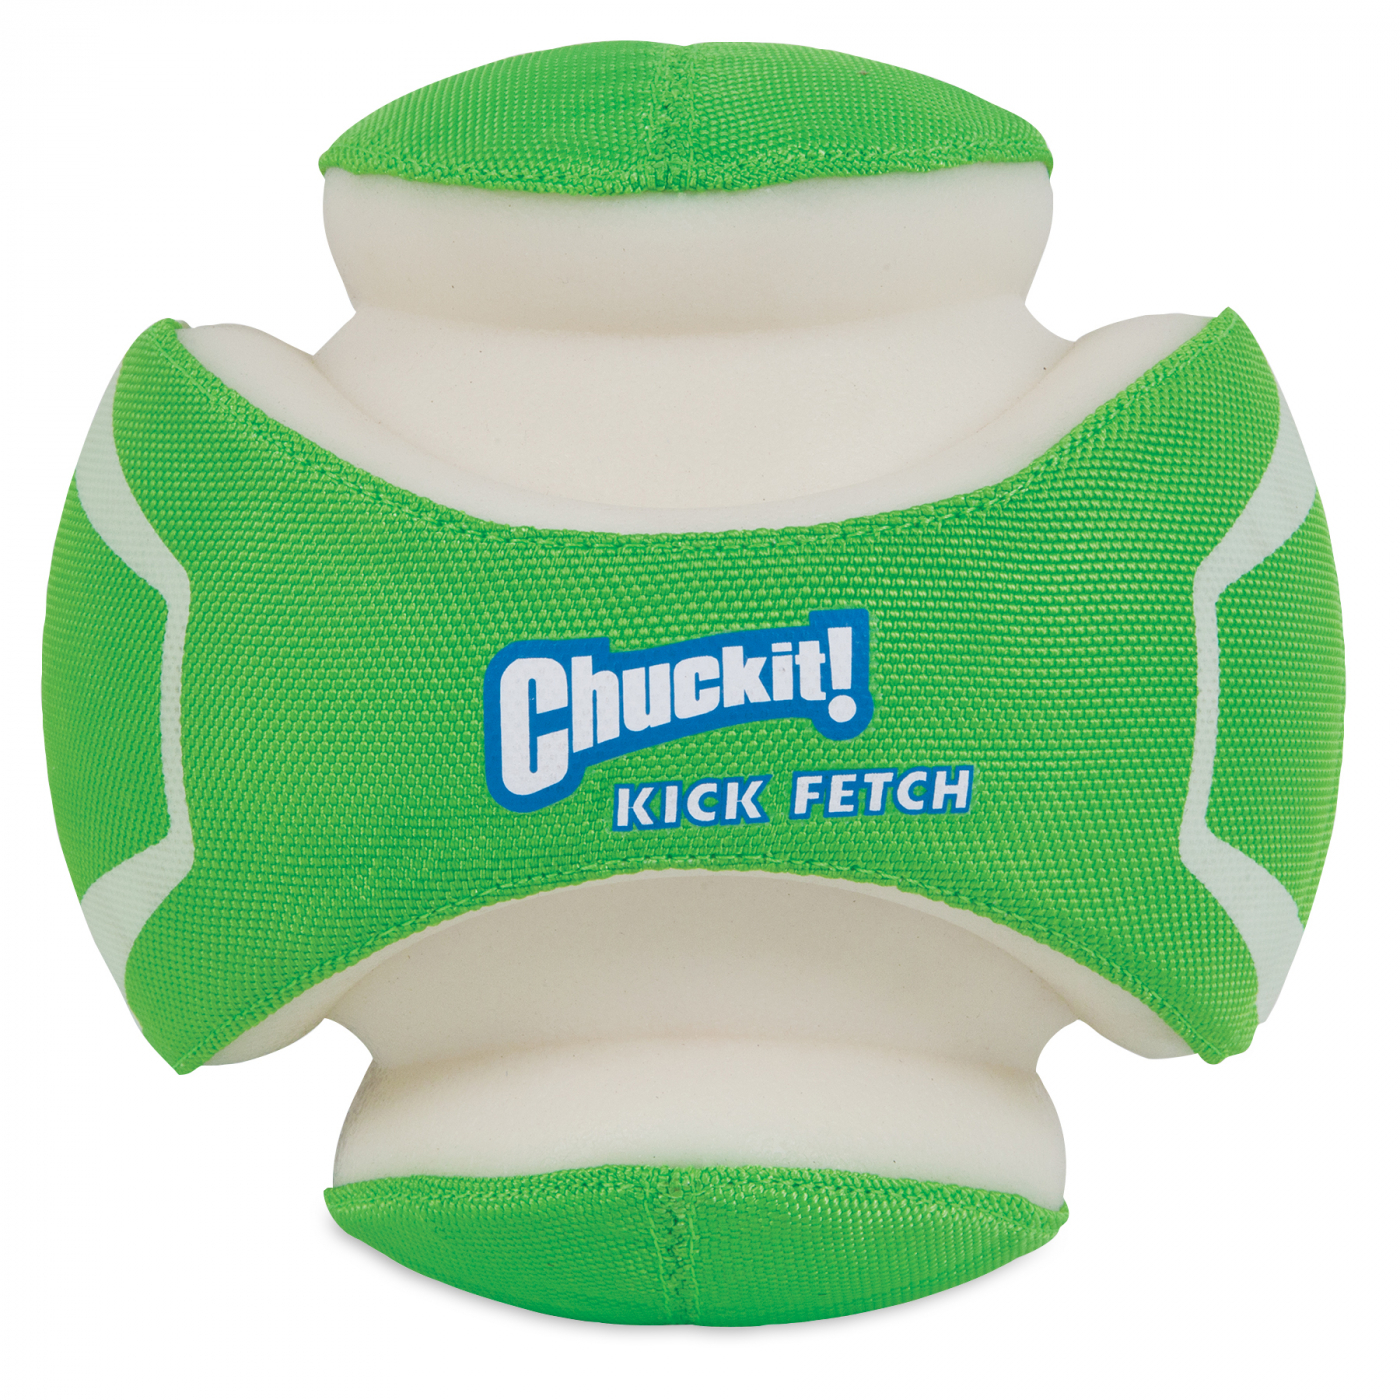 CHUCKIT KICK FETCH MAX GLOW